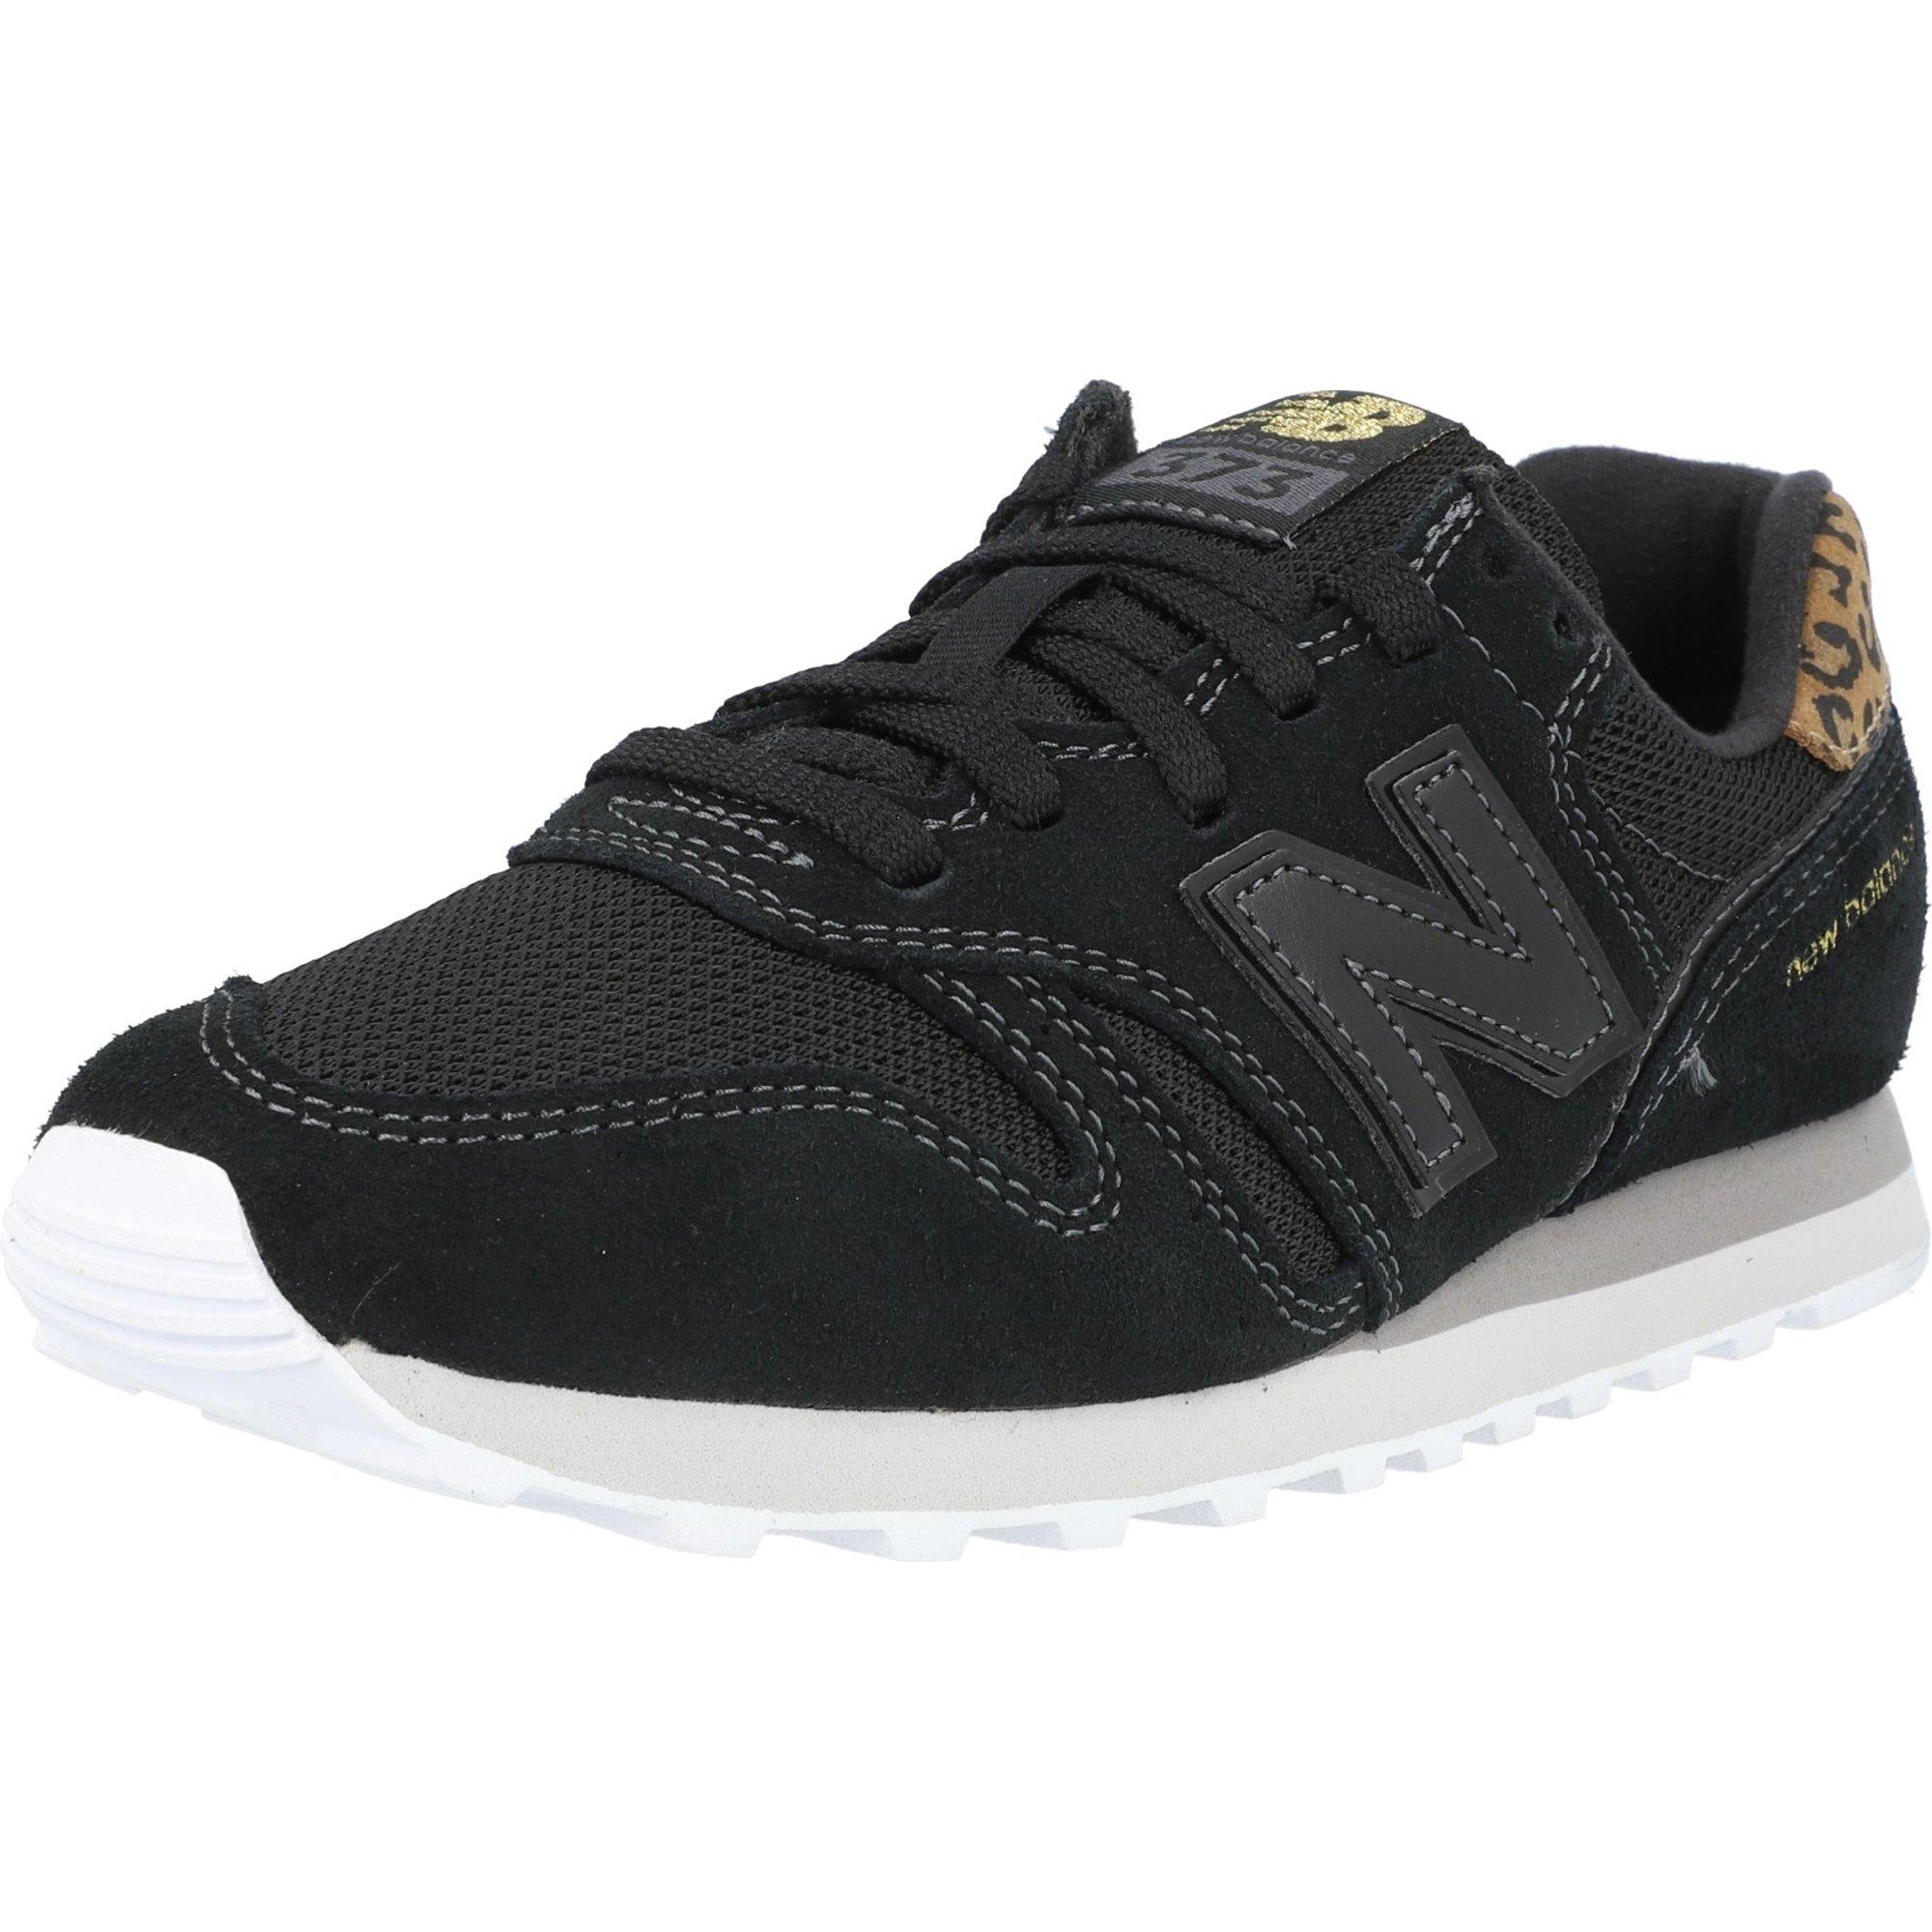 New Balance 373 Black/Gold Suede